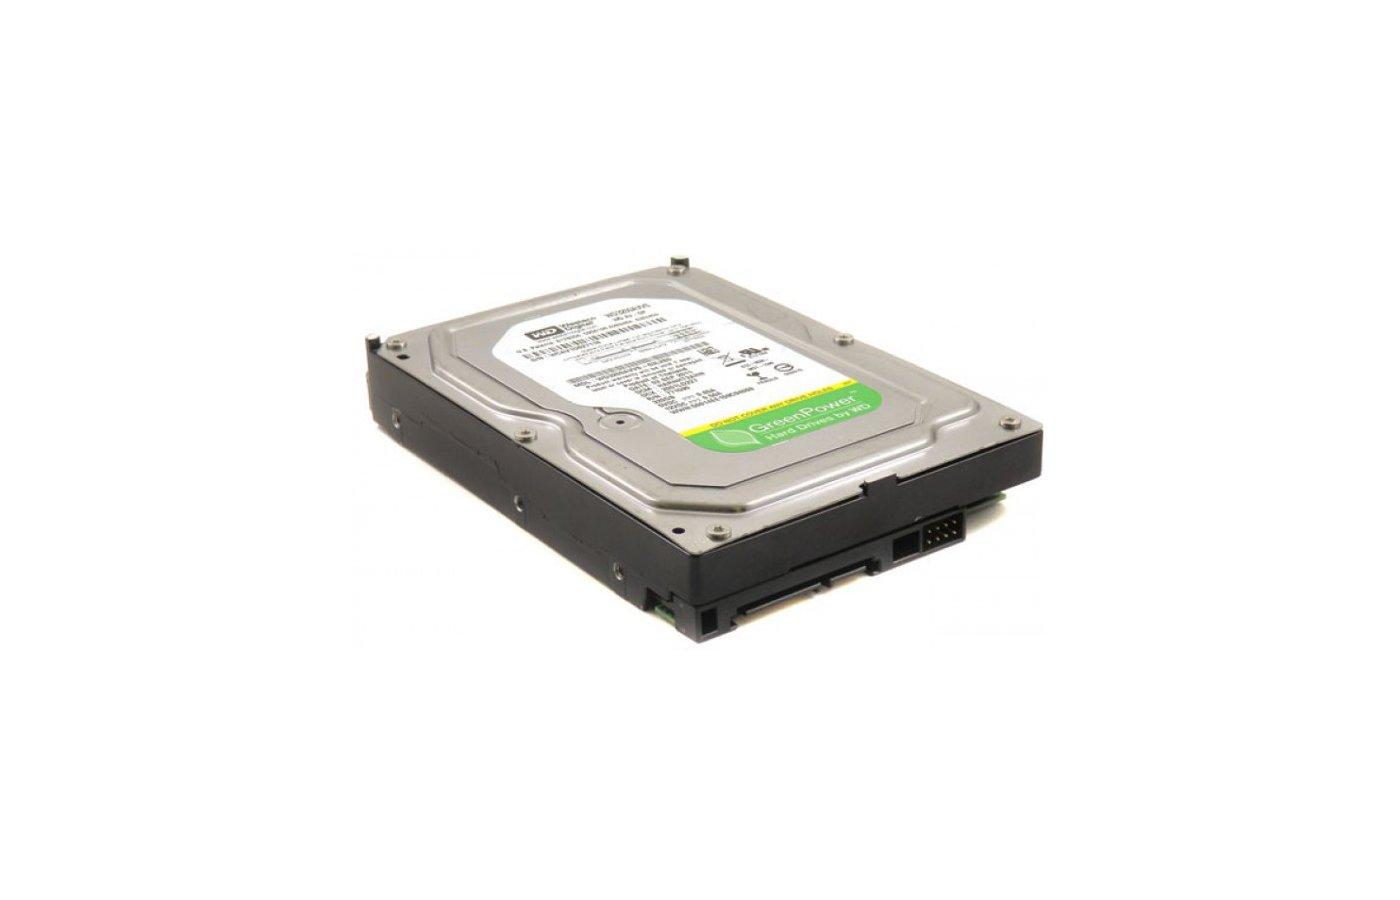 Жесткий диск Western Digital SATAII 320Gb WD3200AVVS Video (AV-GP) 8Mb